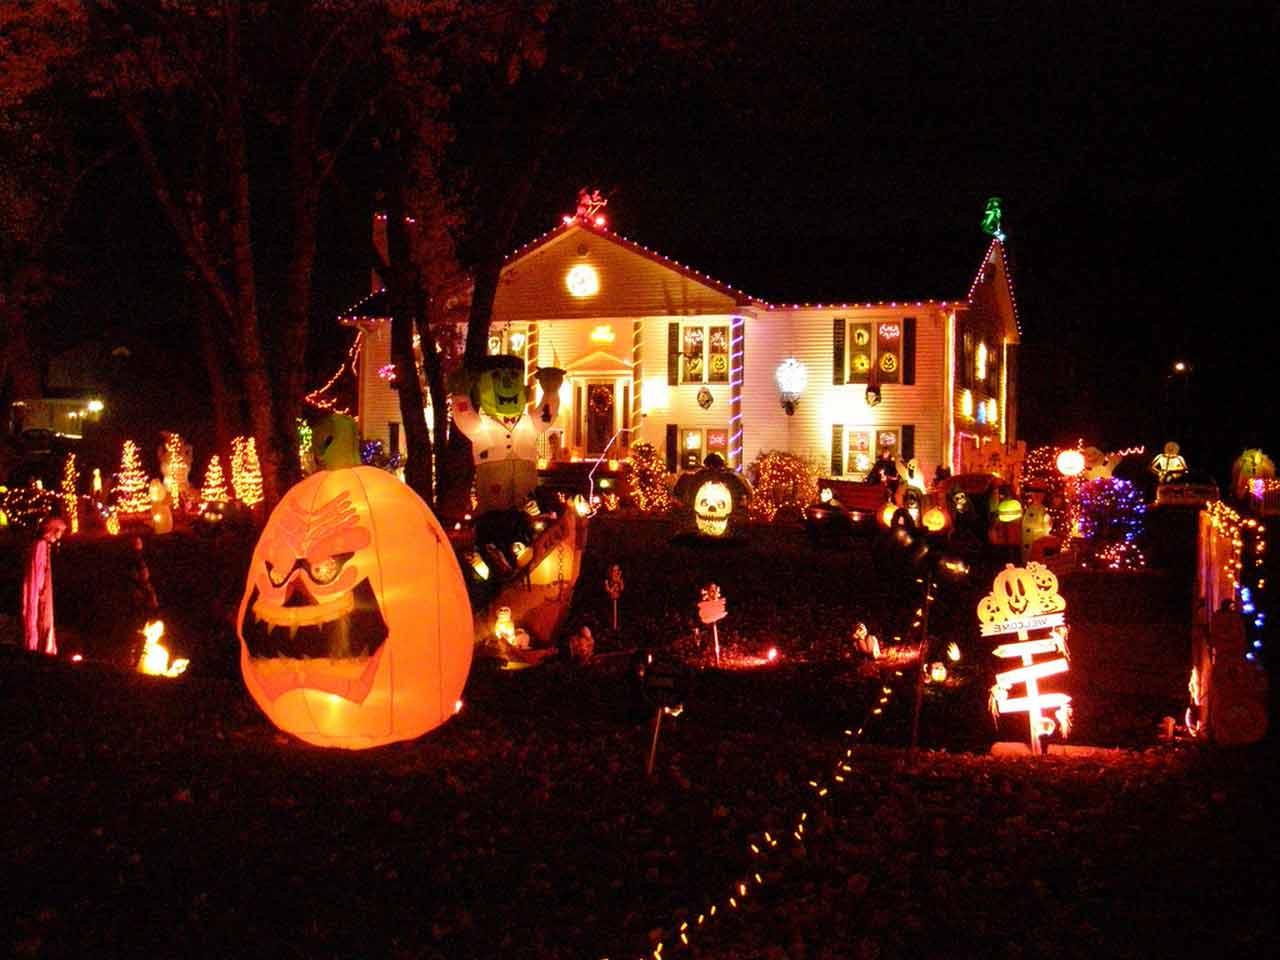 scariest halloween decorations ever-halloween-house